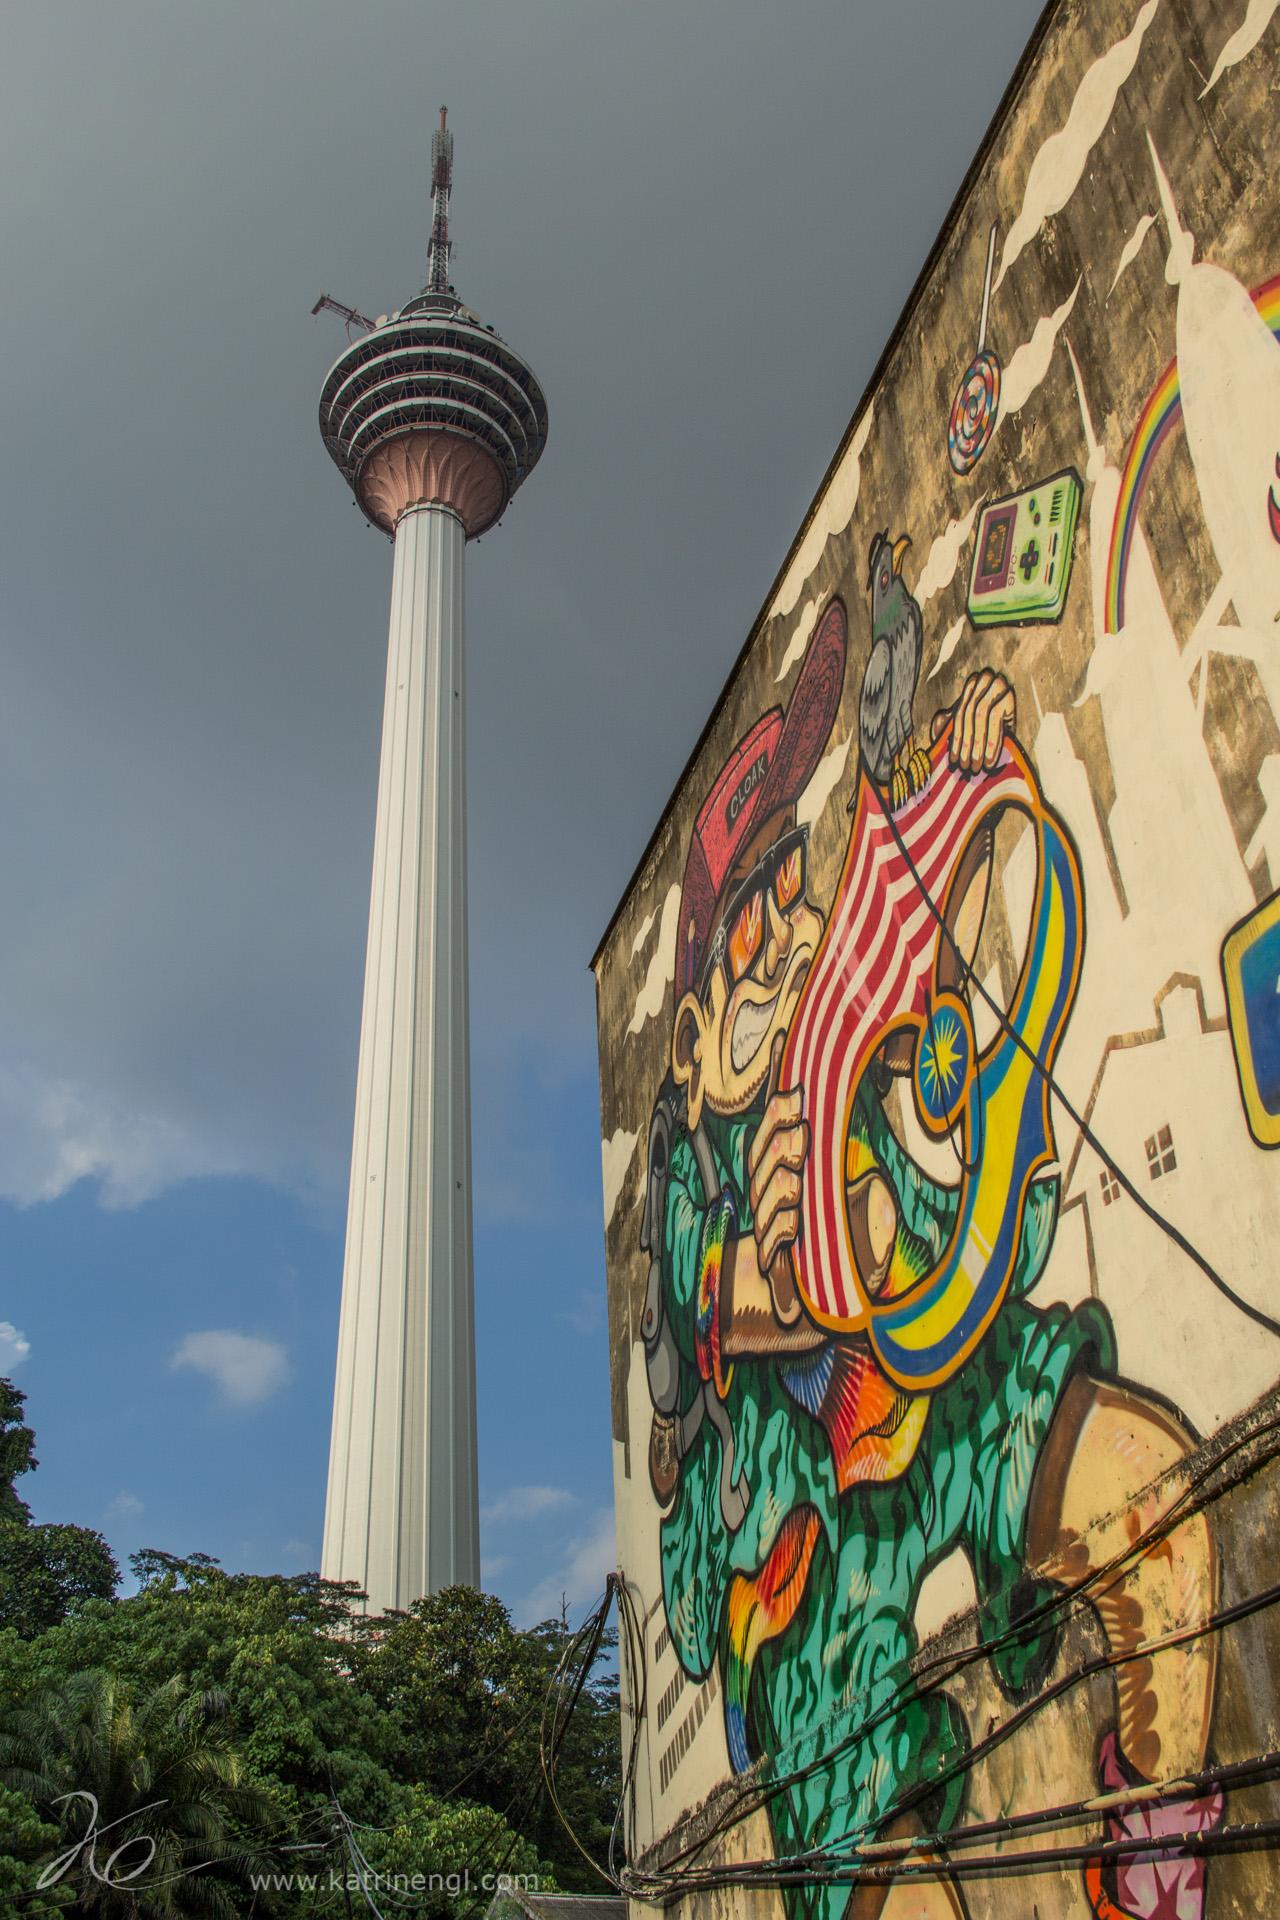 Kuala Lumpur KL Tower Graffiti wall